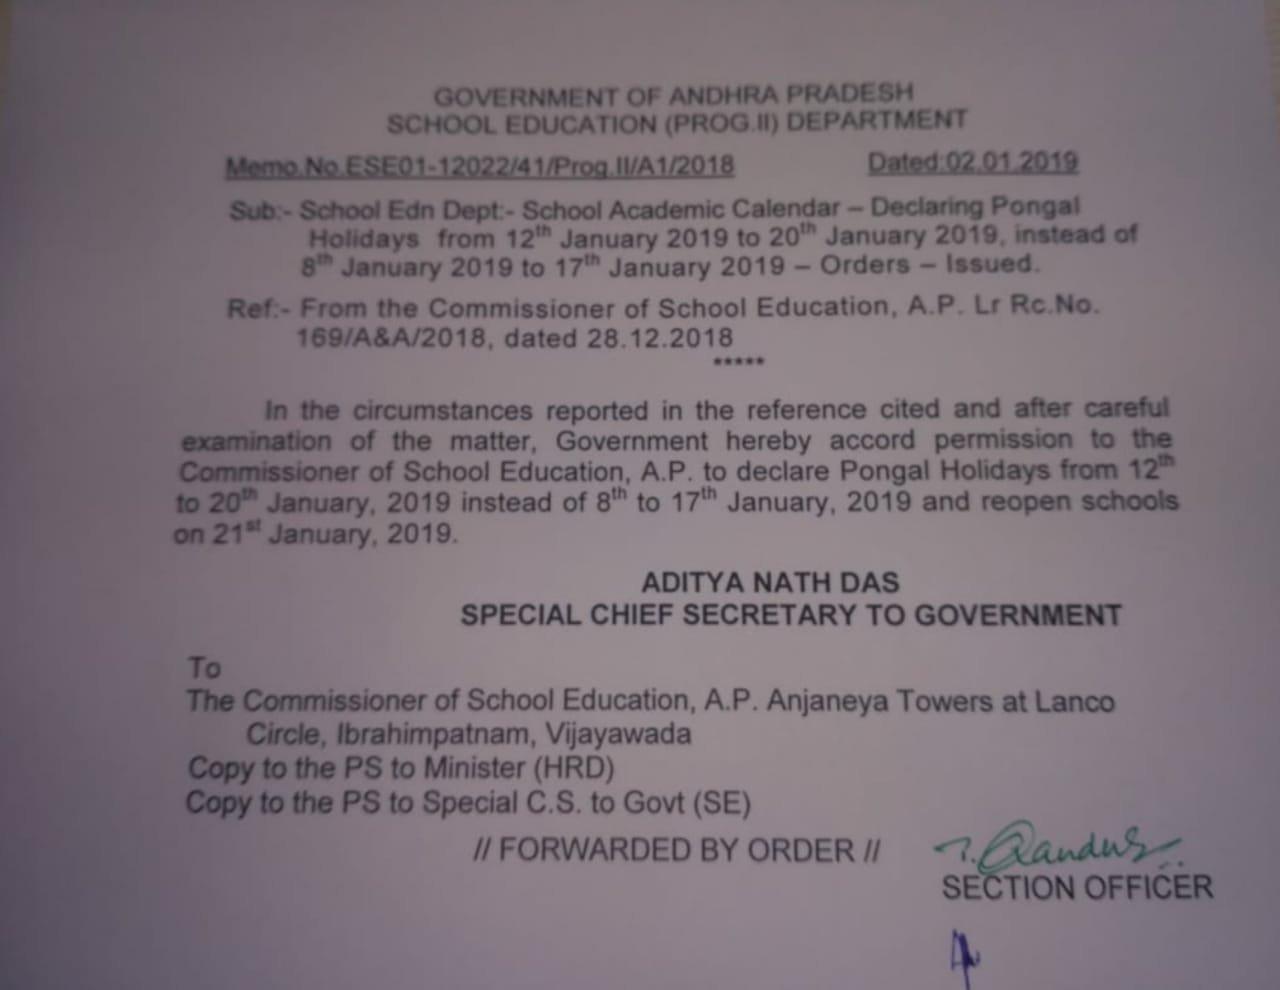 AP Schools Pongal/Sankranthi Holidays from 12th Jan to 20th Jan 2019